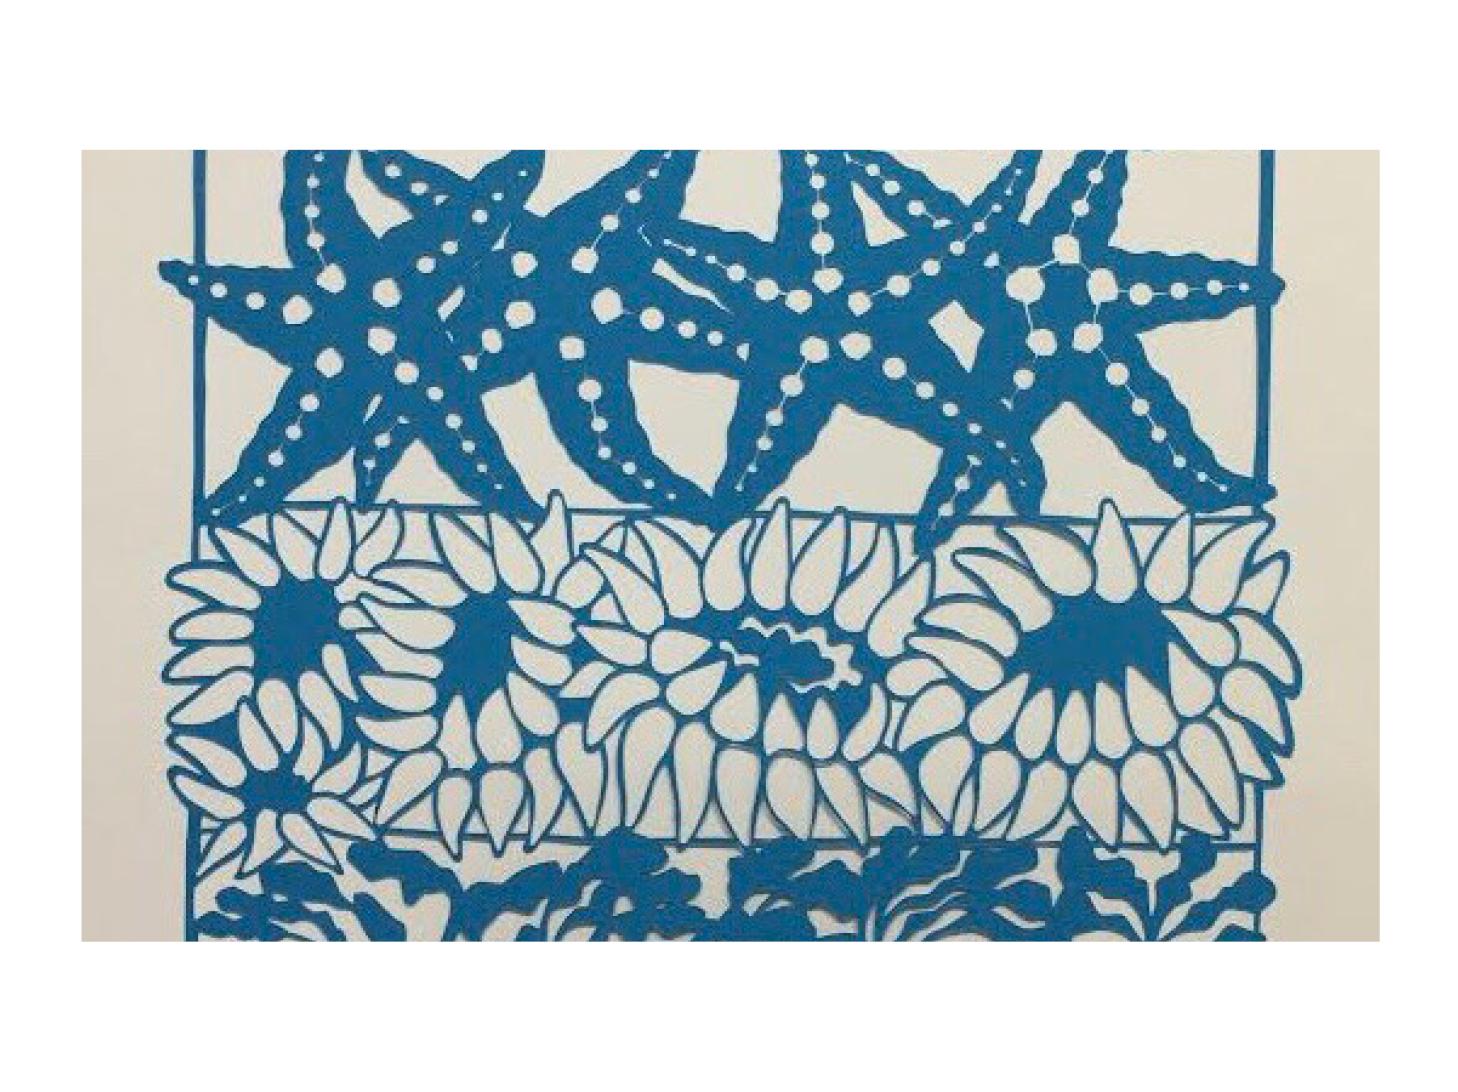 image of papercuts art exhibit